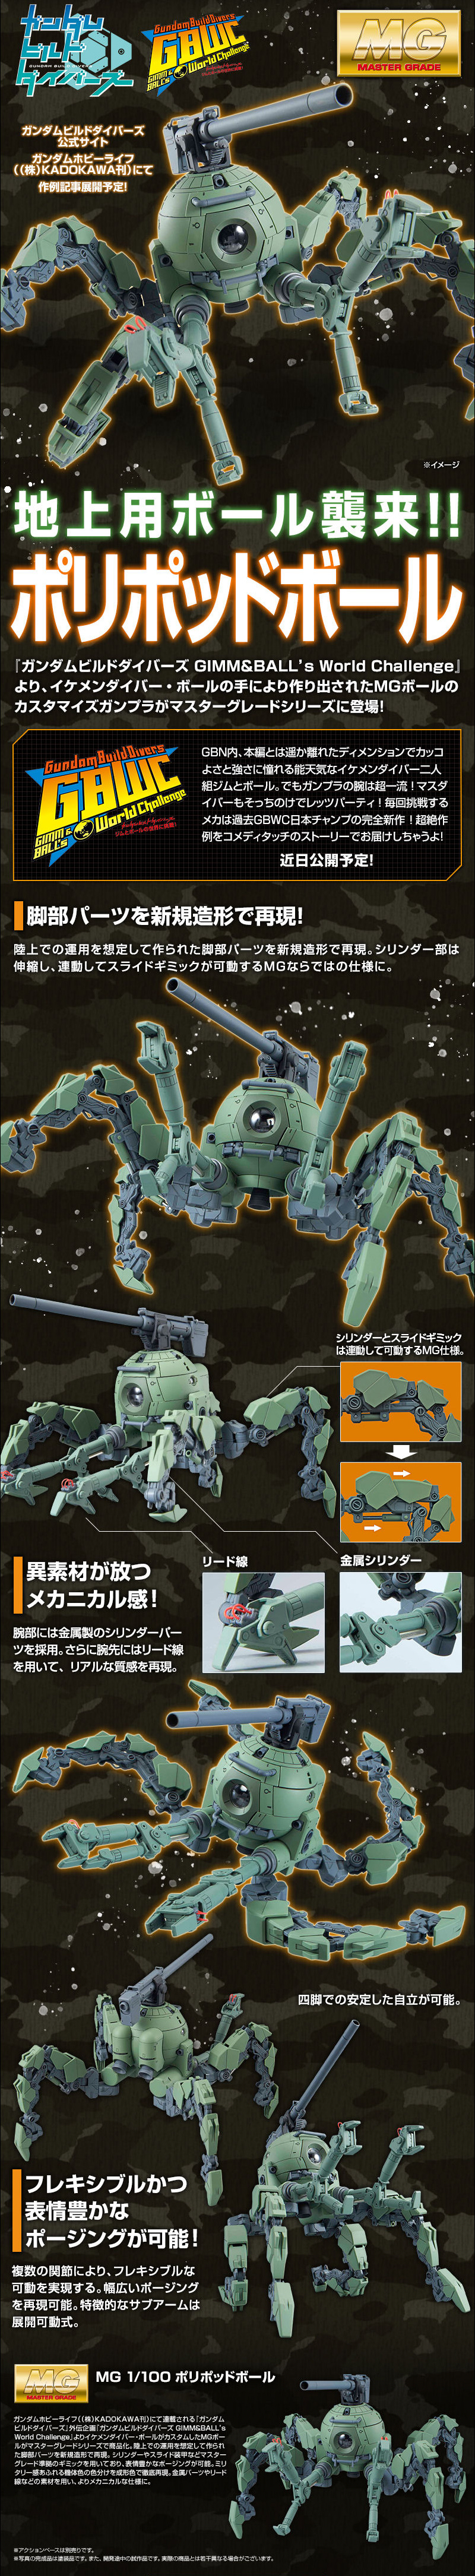 P-Bandai MG Polypod Ball Details